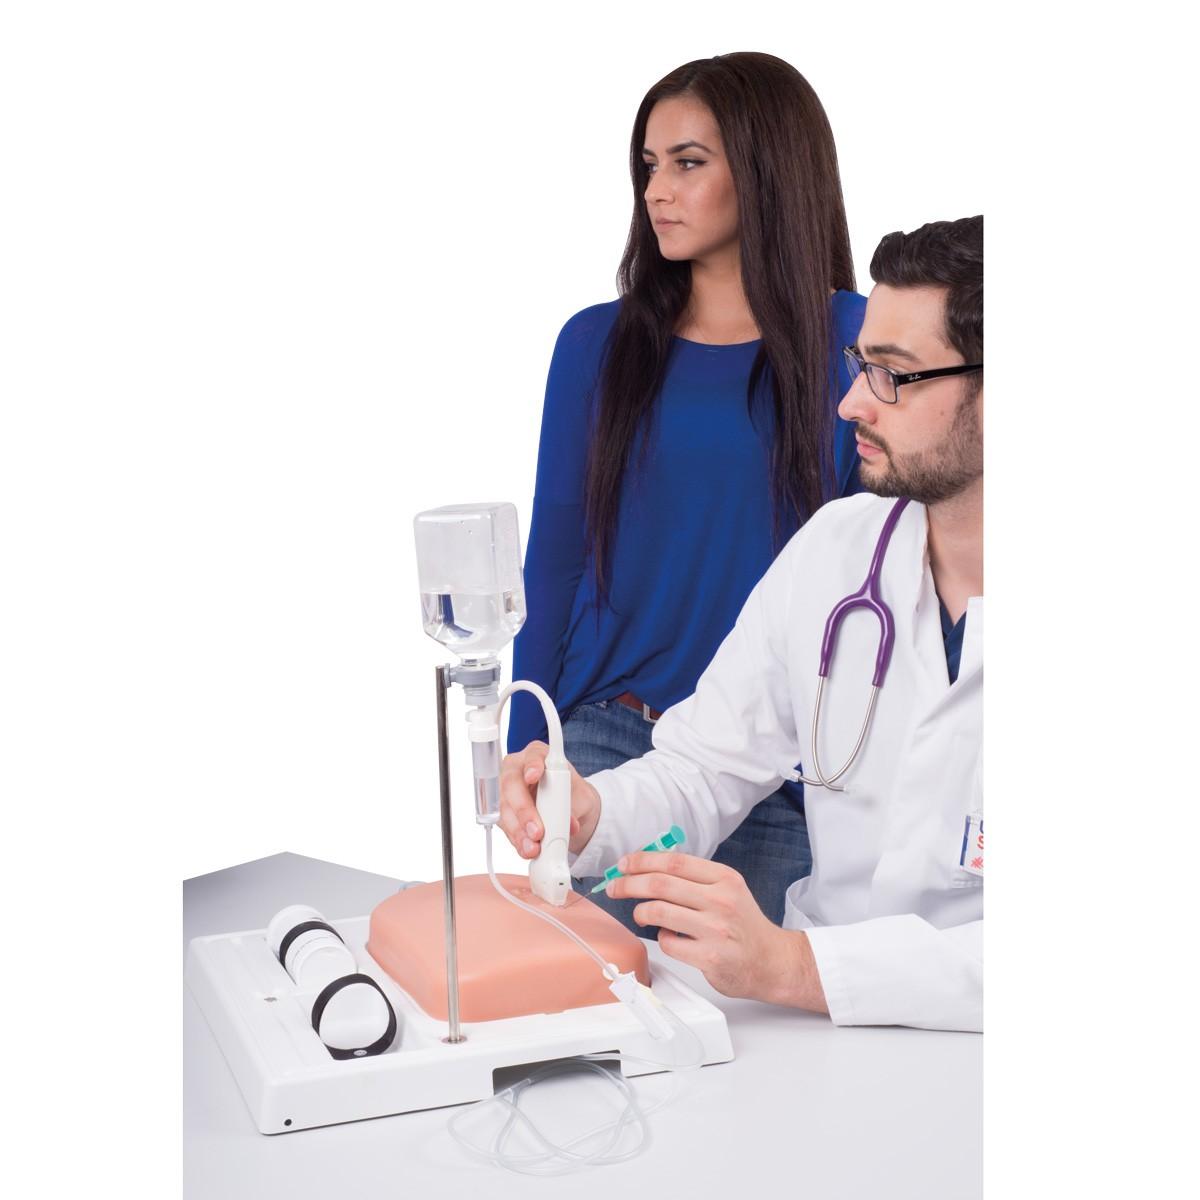 SONOtrain™ Ultraschall Venenmodell